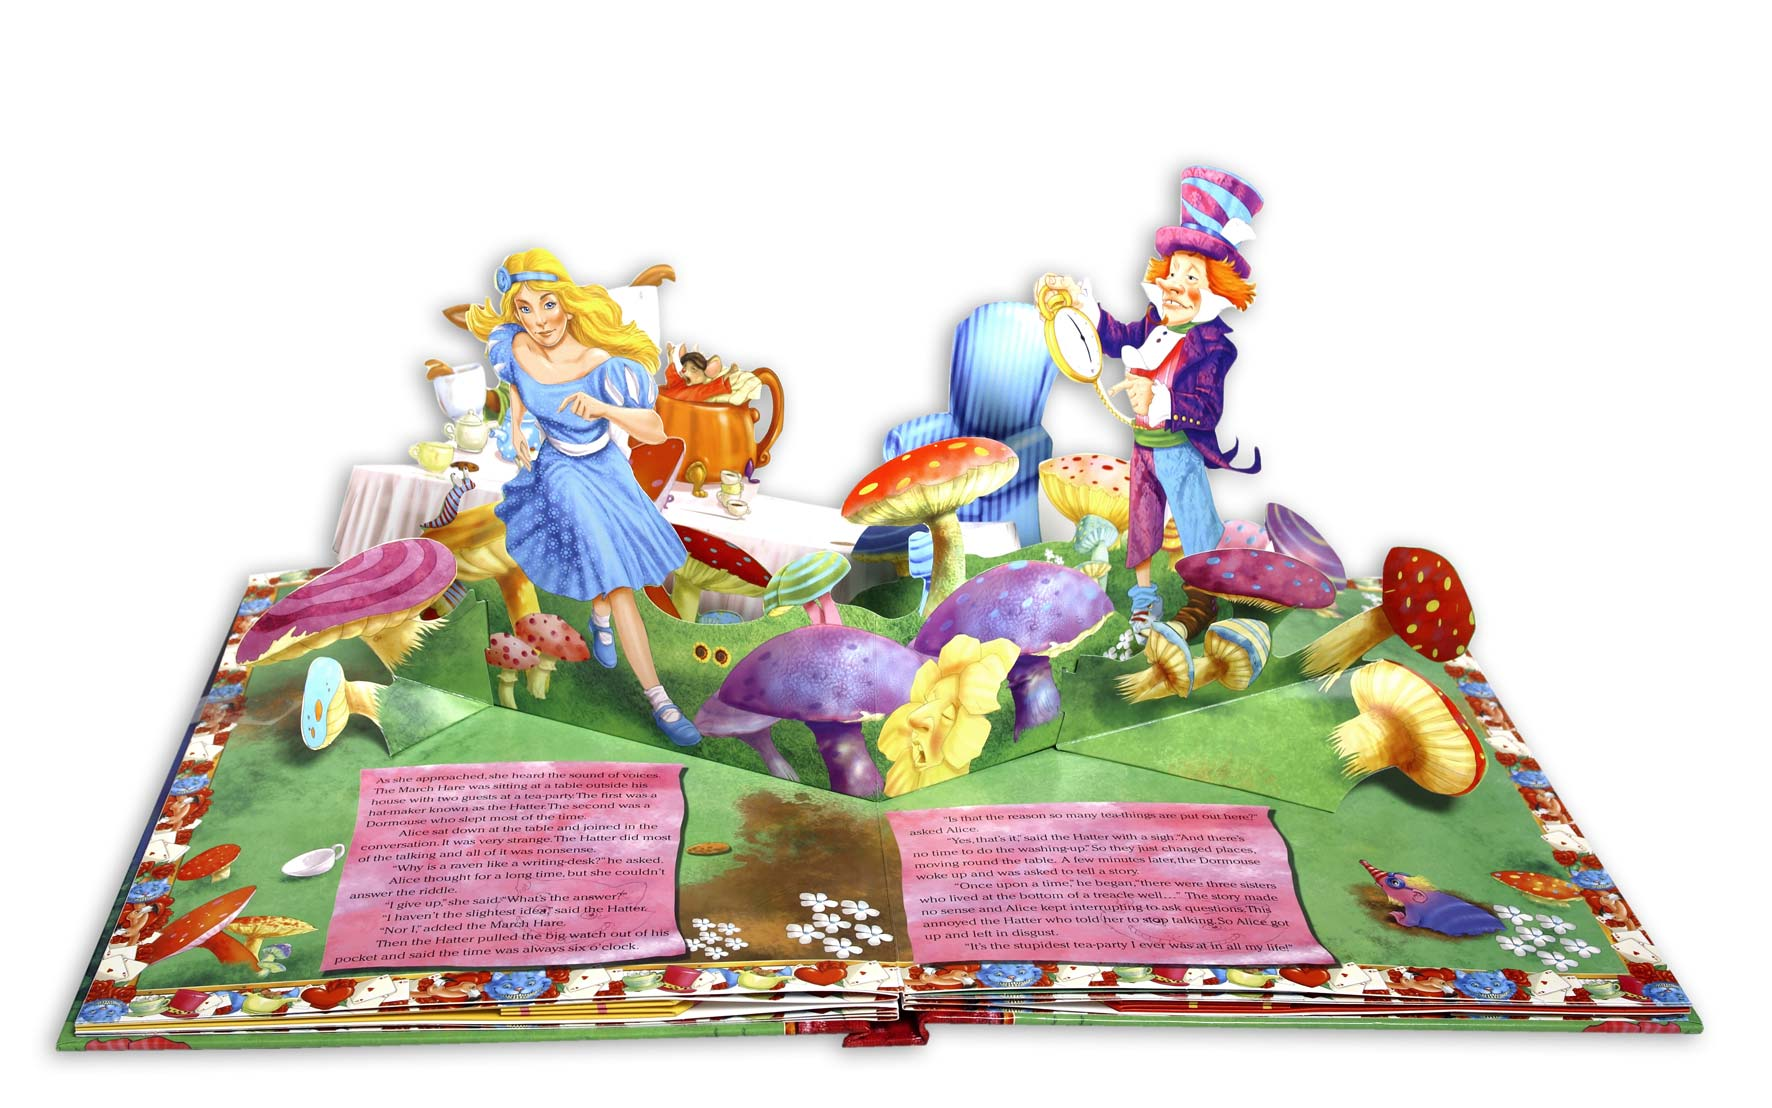 Alice POp up book